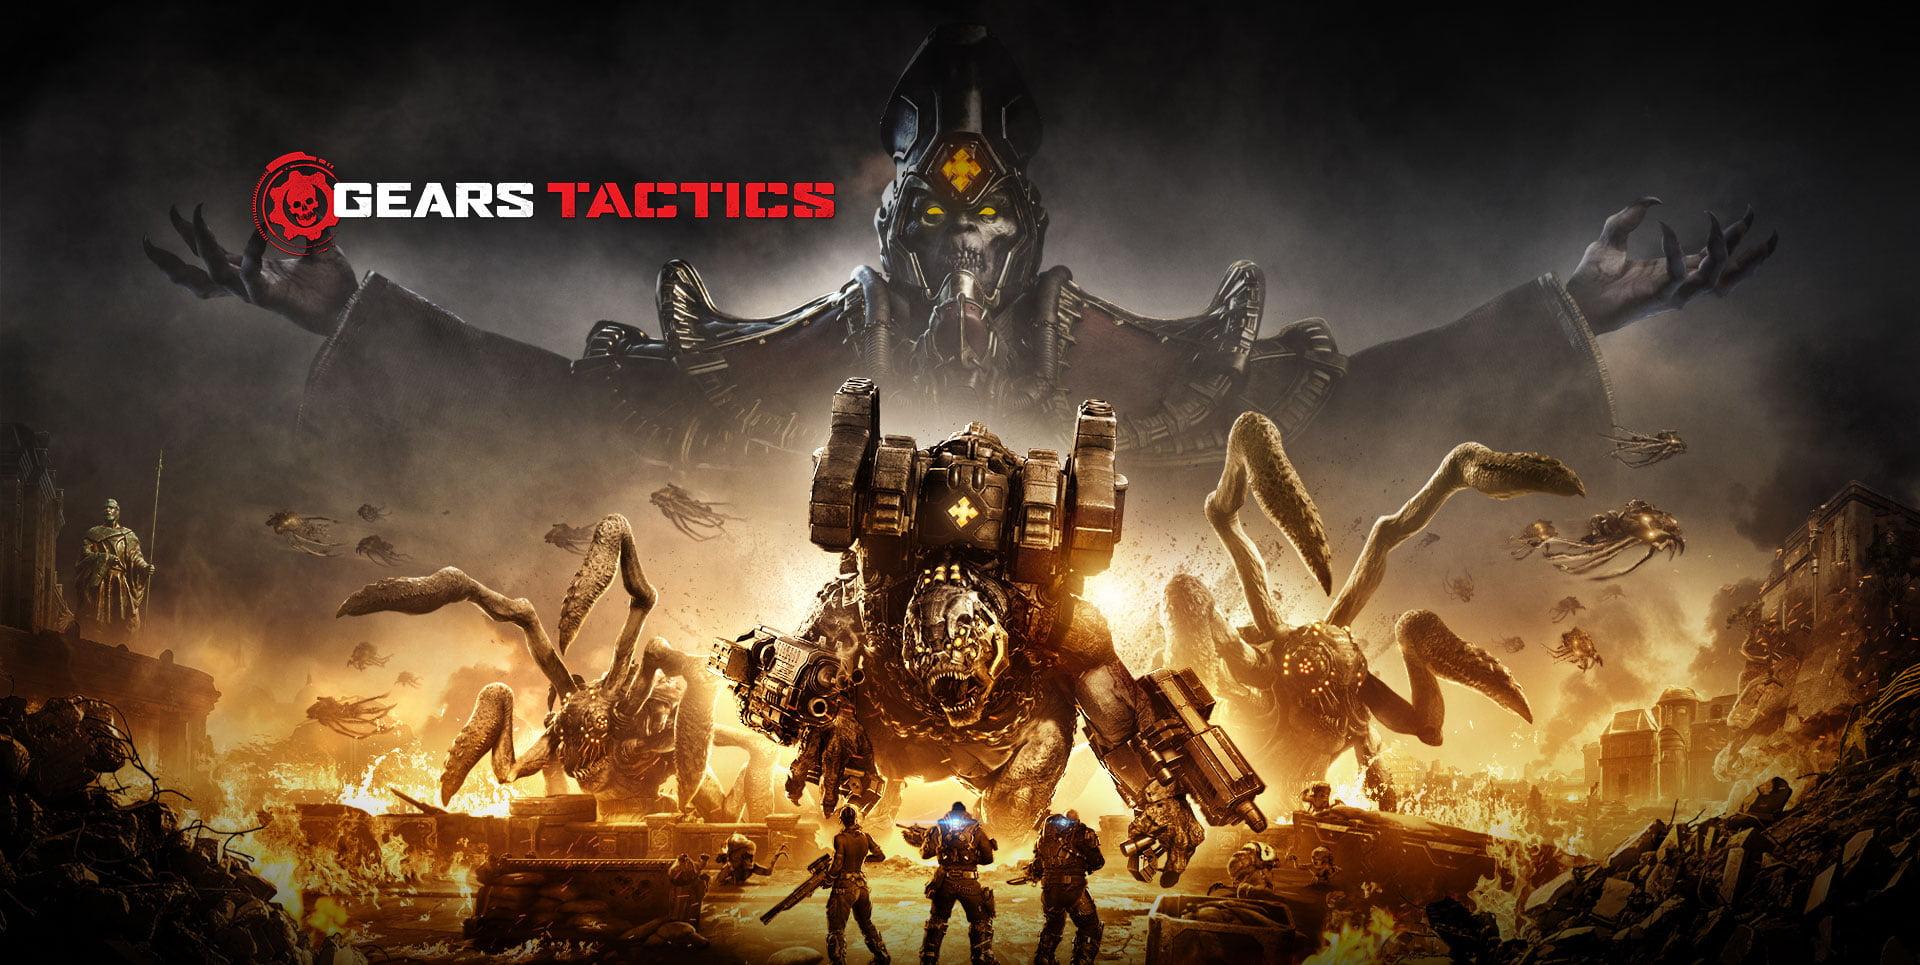 Gears Tactics: Uscito Mesi Fa Su Pc